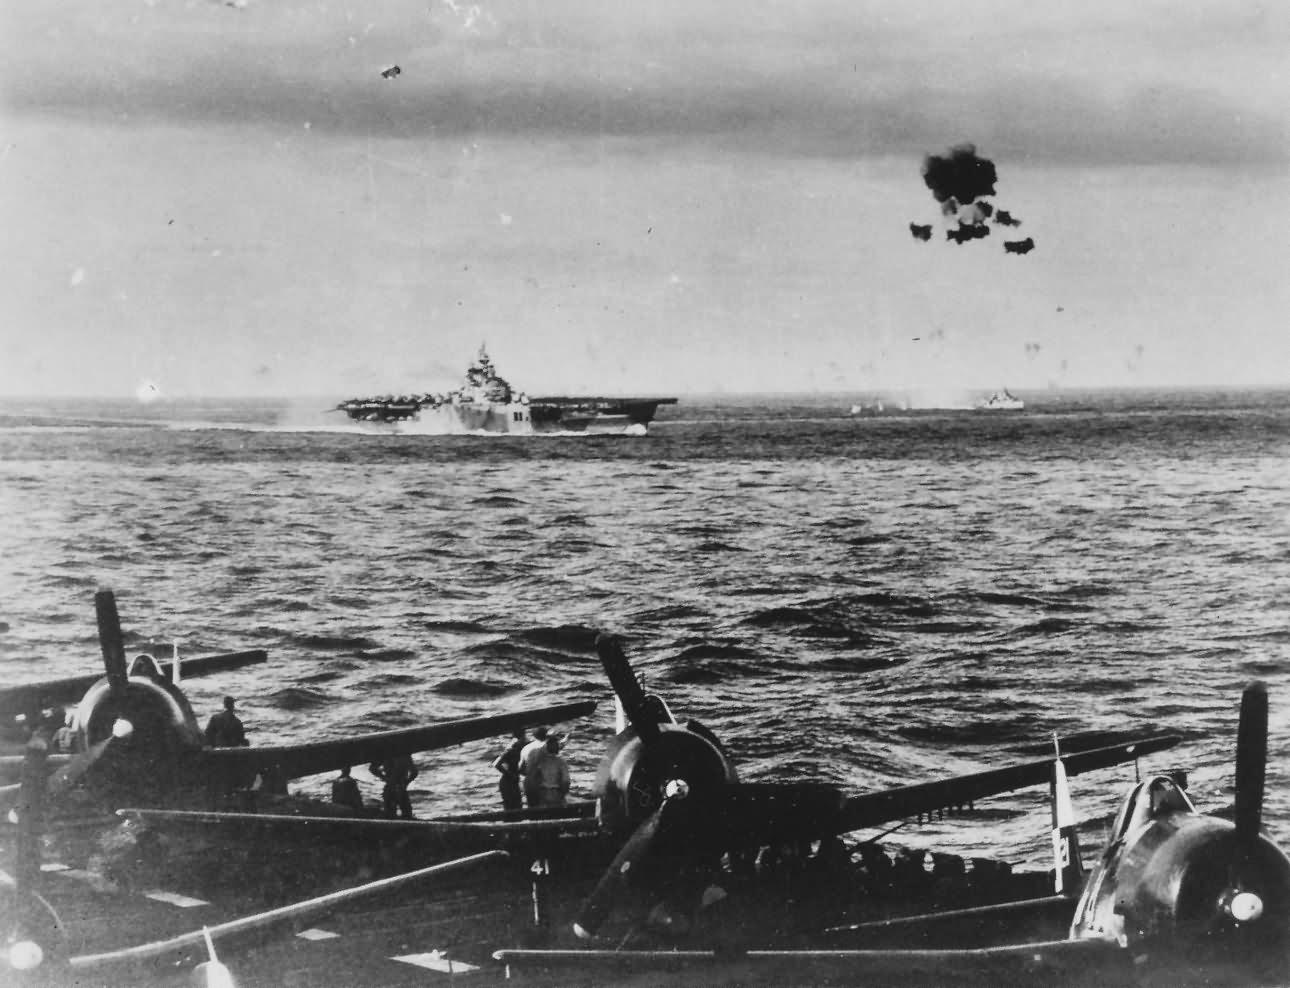 Kamikaze explode in mid air over carrier USS Bennington CV-20